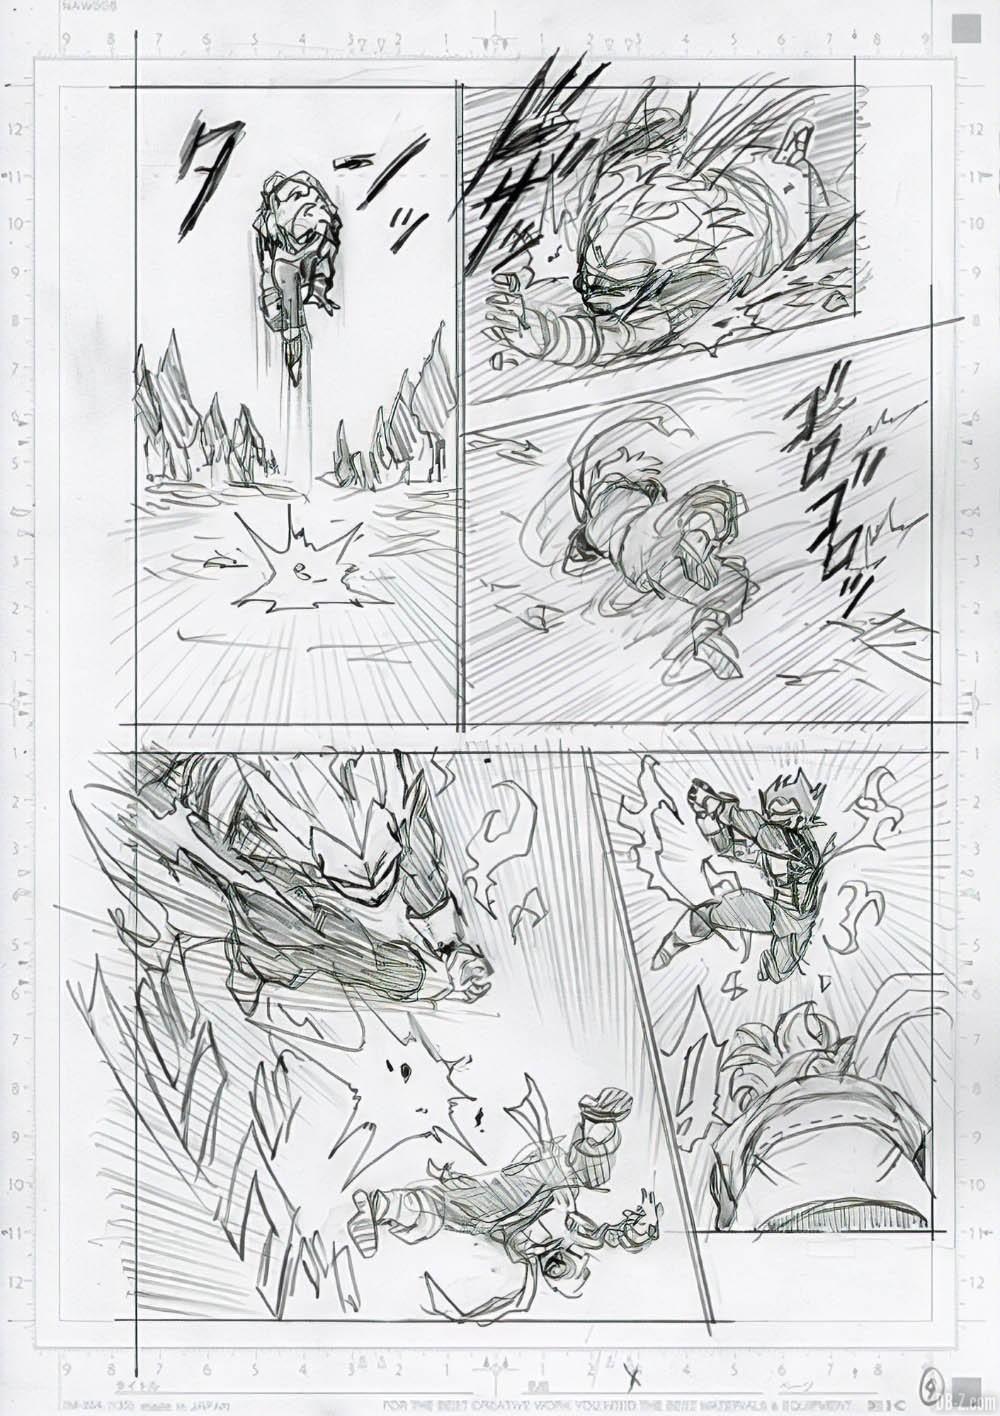 Dragon-Ball-Super-Chapitre-75-Brouillon-4-4x Manga109Attempt